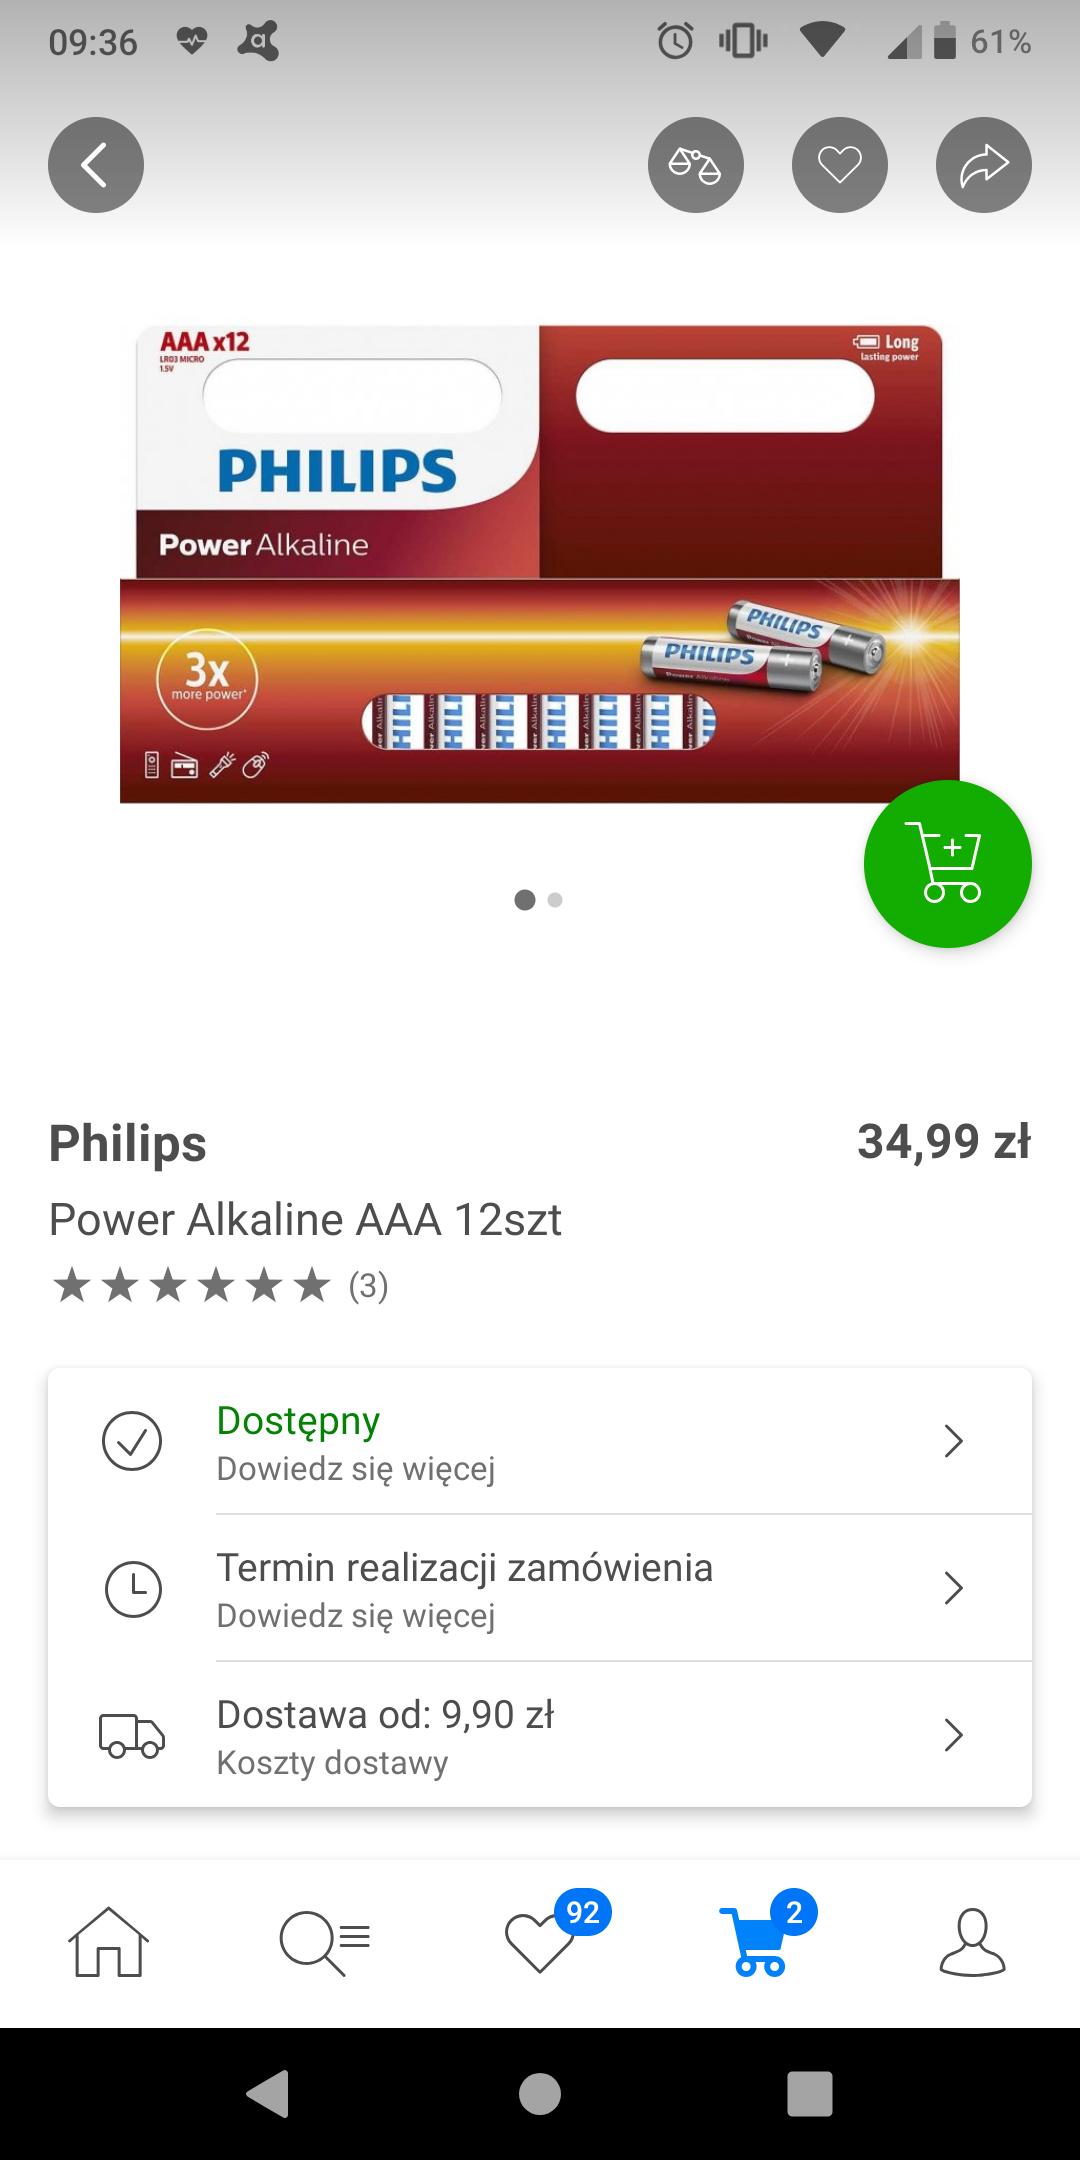 Philips Power Alkaline AAA 12szt